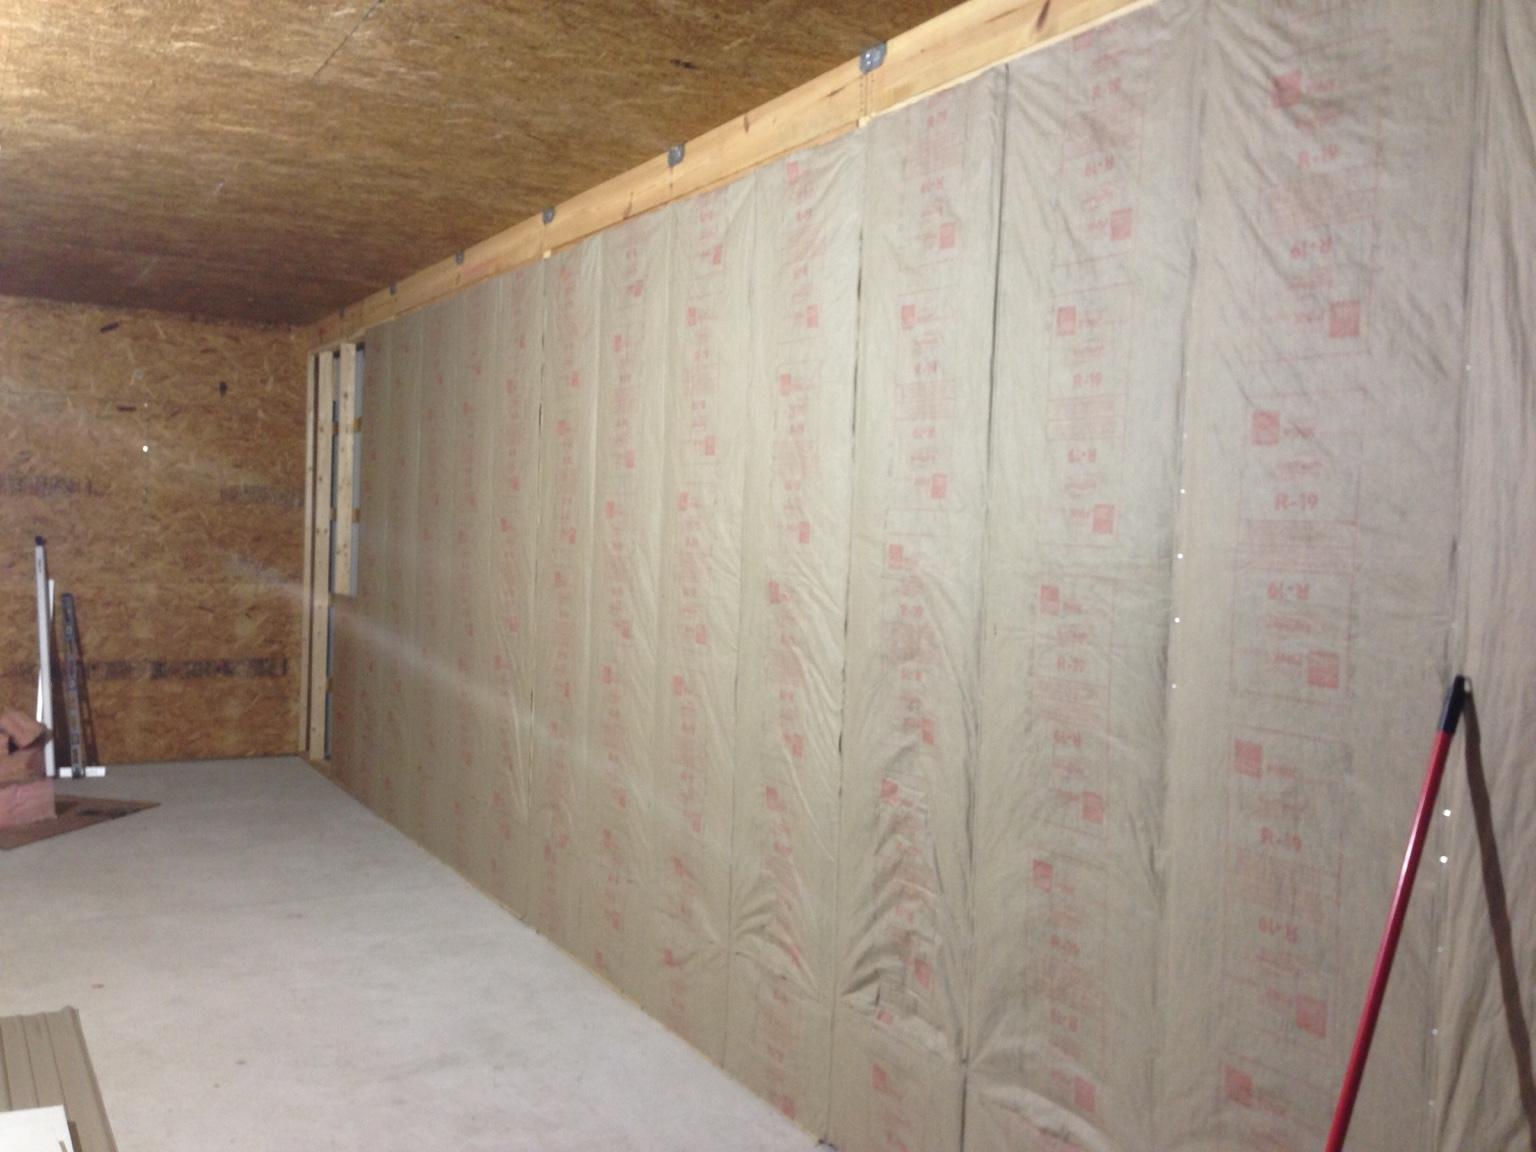 Pole Barn - Vapor Barrier - Yes or No - The Garage Journal Board